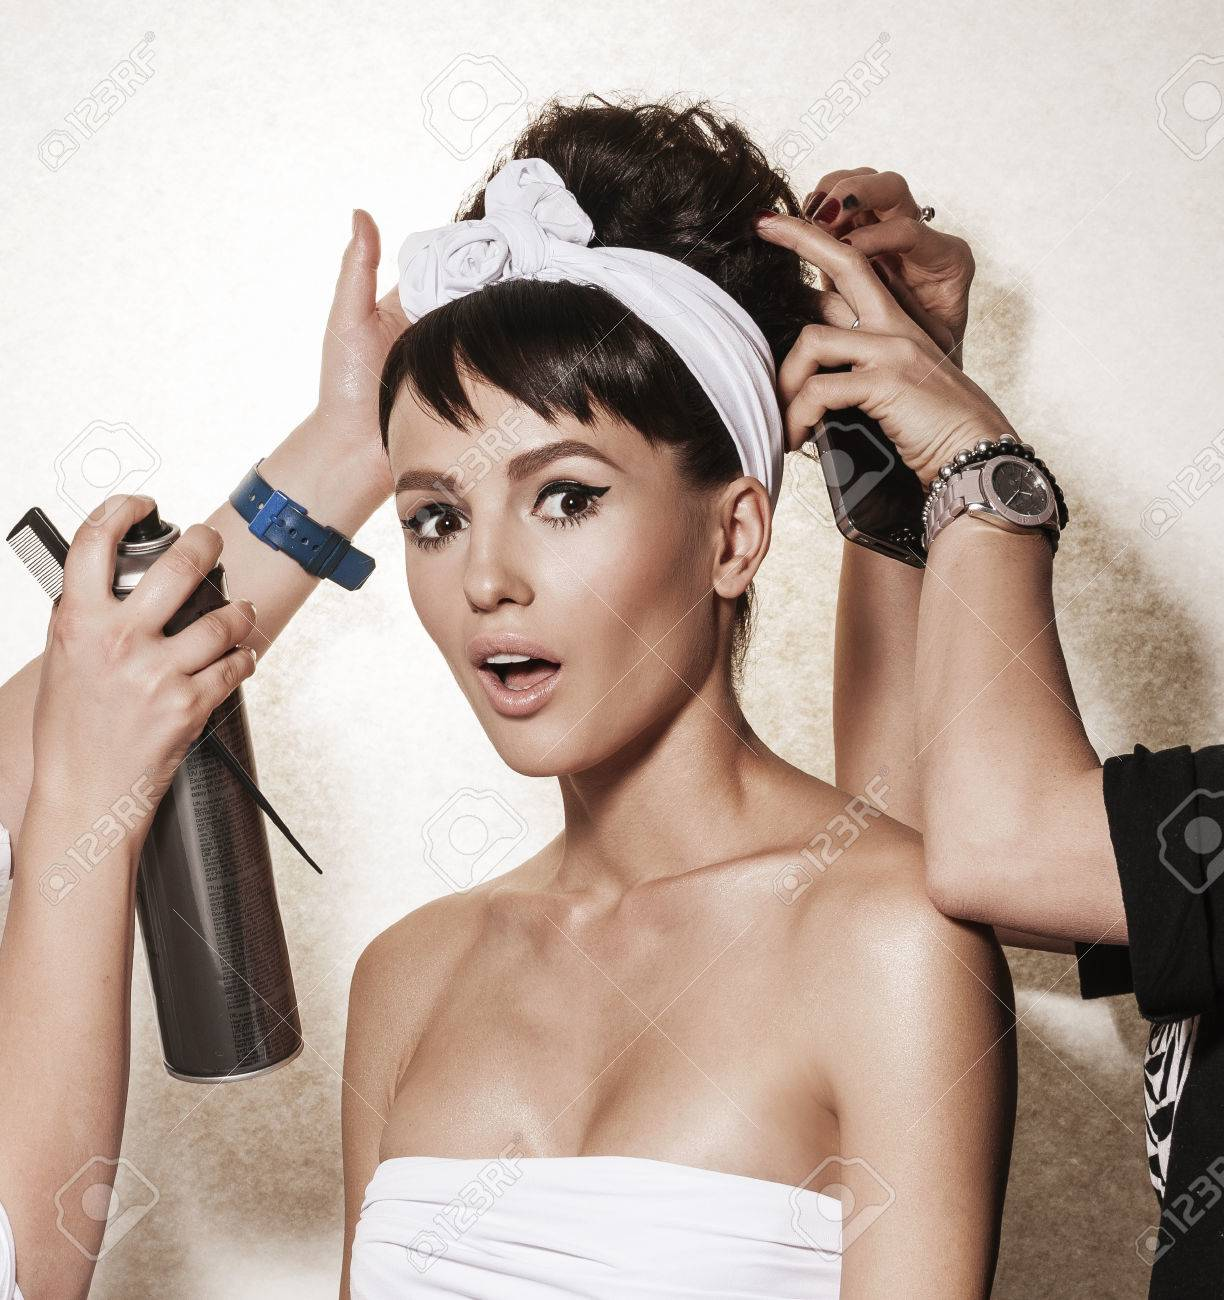 Backstage Photo Bridal Rituals Before Wedding Beautiful Brunette